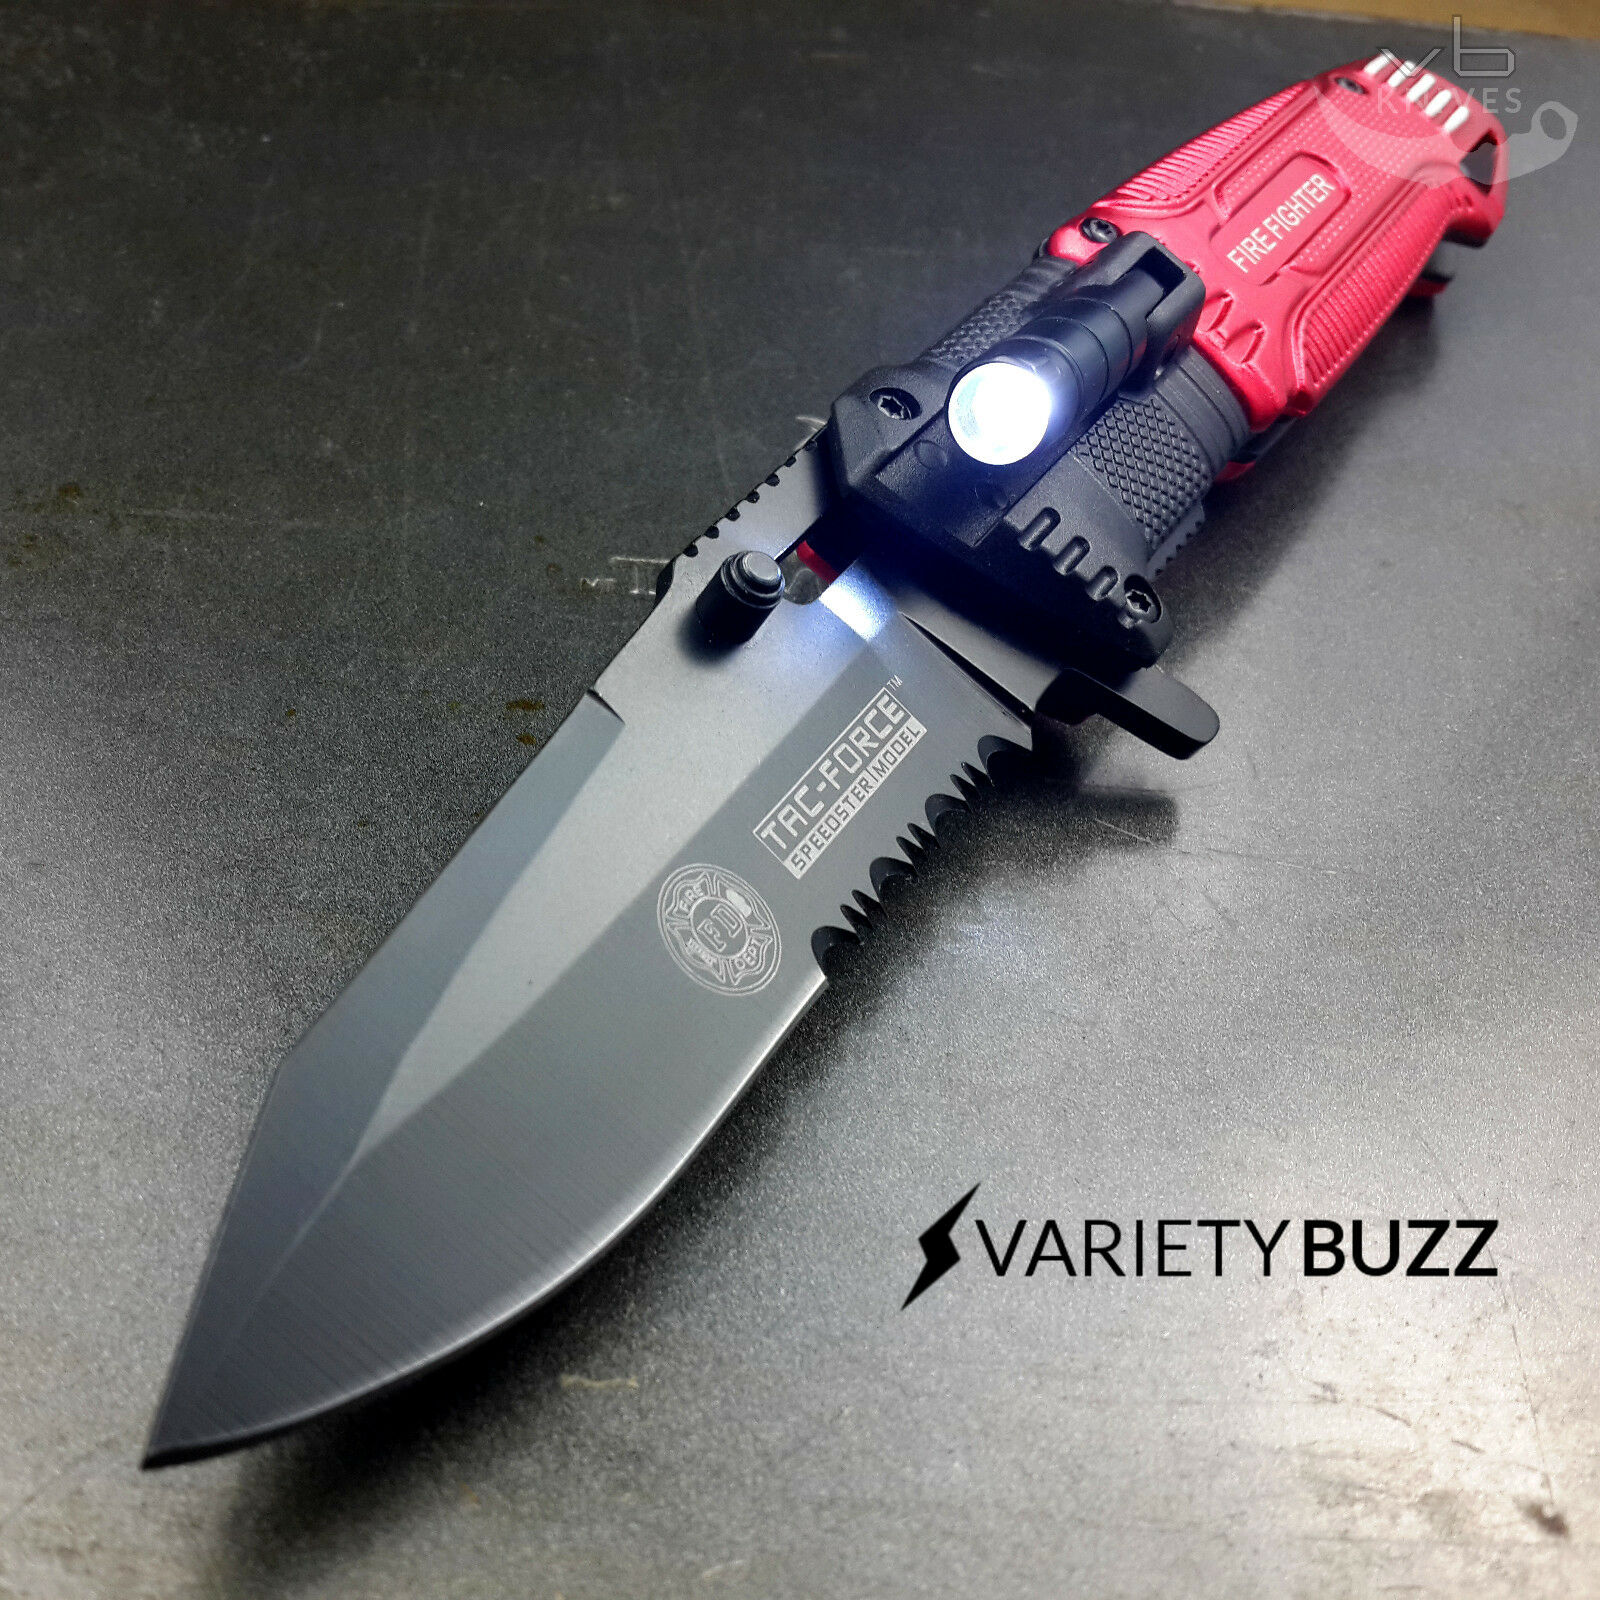 Black EDC Spring Assisted LED Multifunction Pocket Knife Survival MULTI TOOL New